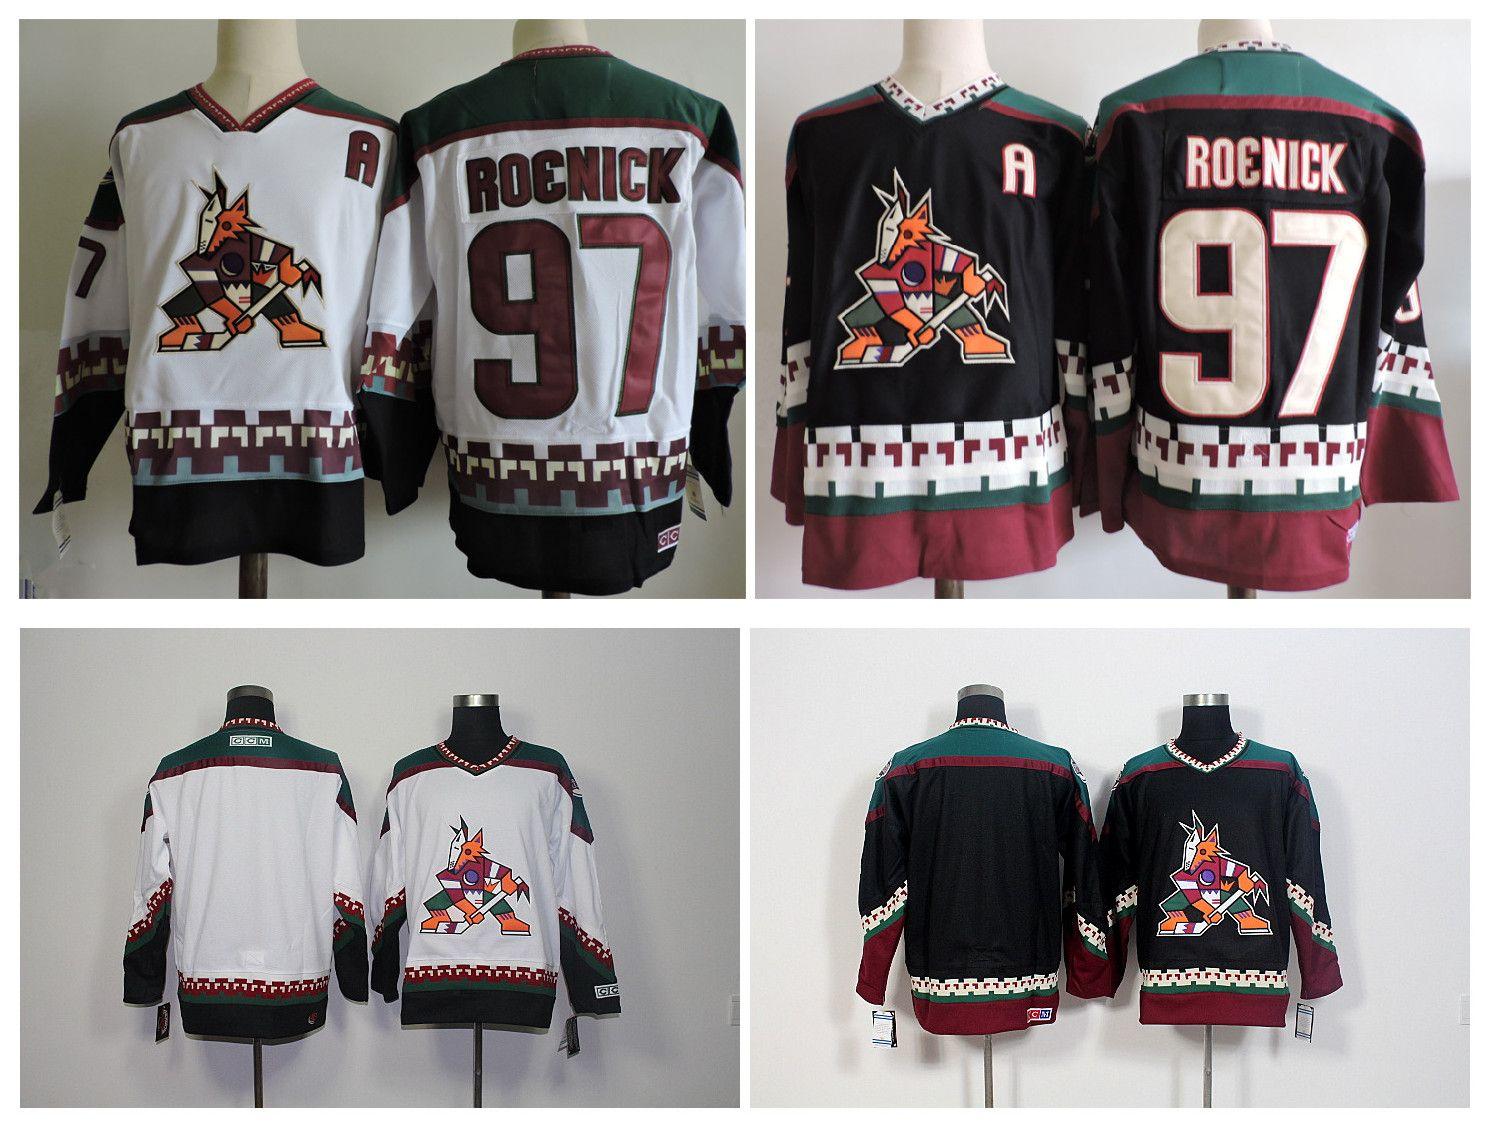 Top Quality ! 2016 Men Phoenix Coyotes 97 Jeremy Roenick Hockey Jerseys Cheap Arizona Blank Authentic Retro Vintage CCM Stitched Jerseys